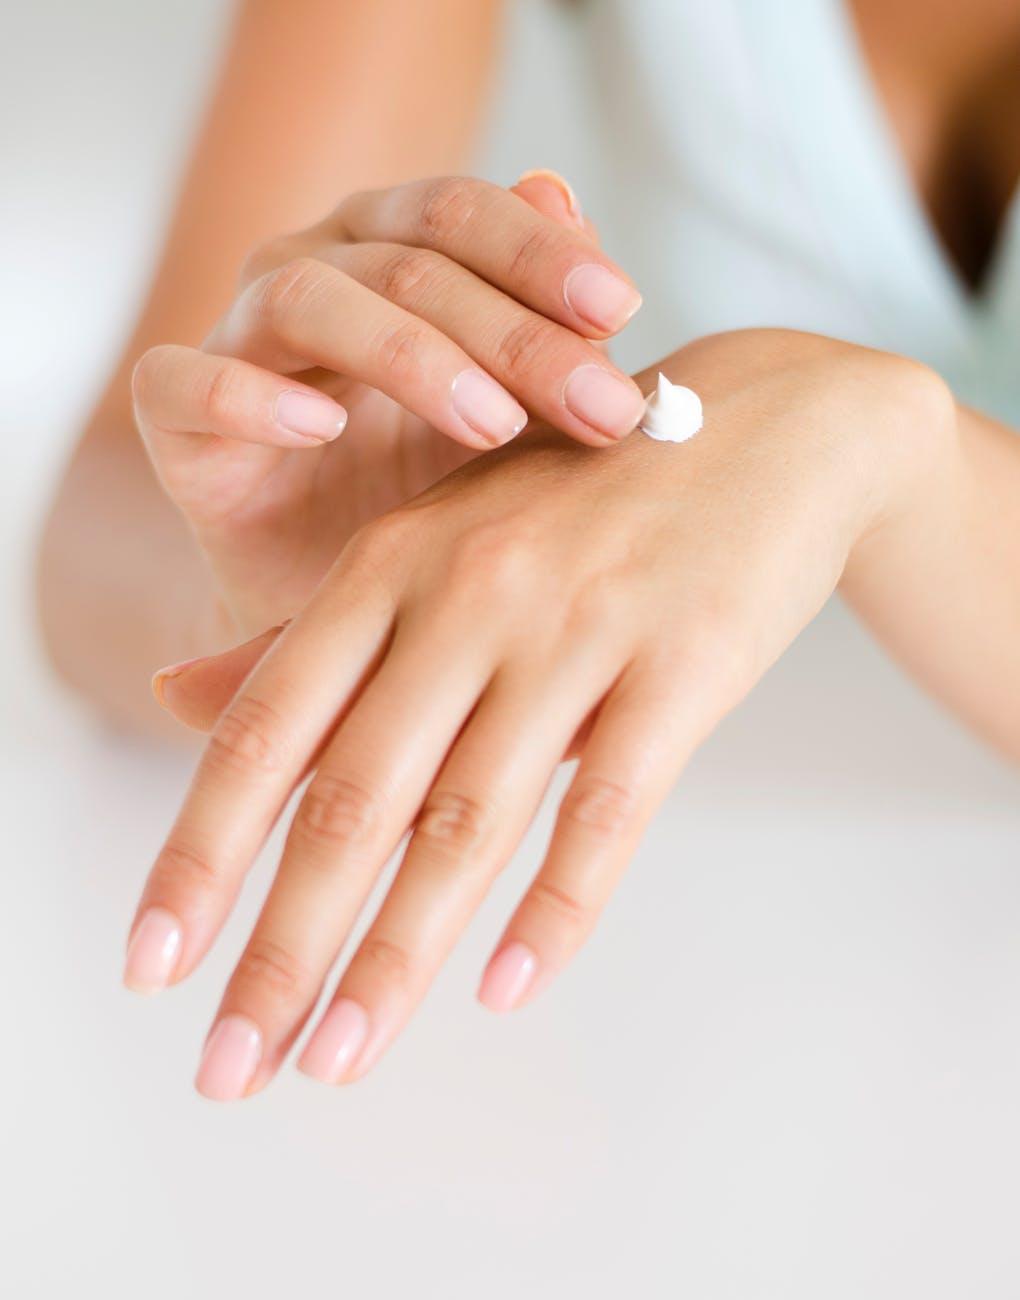 hidrata tu piel por dentro tomando agua